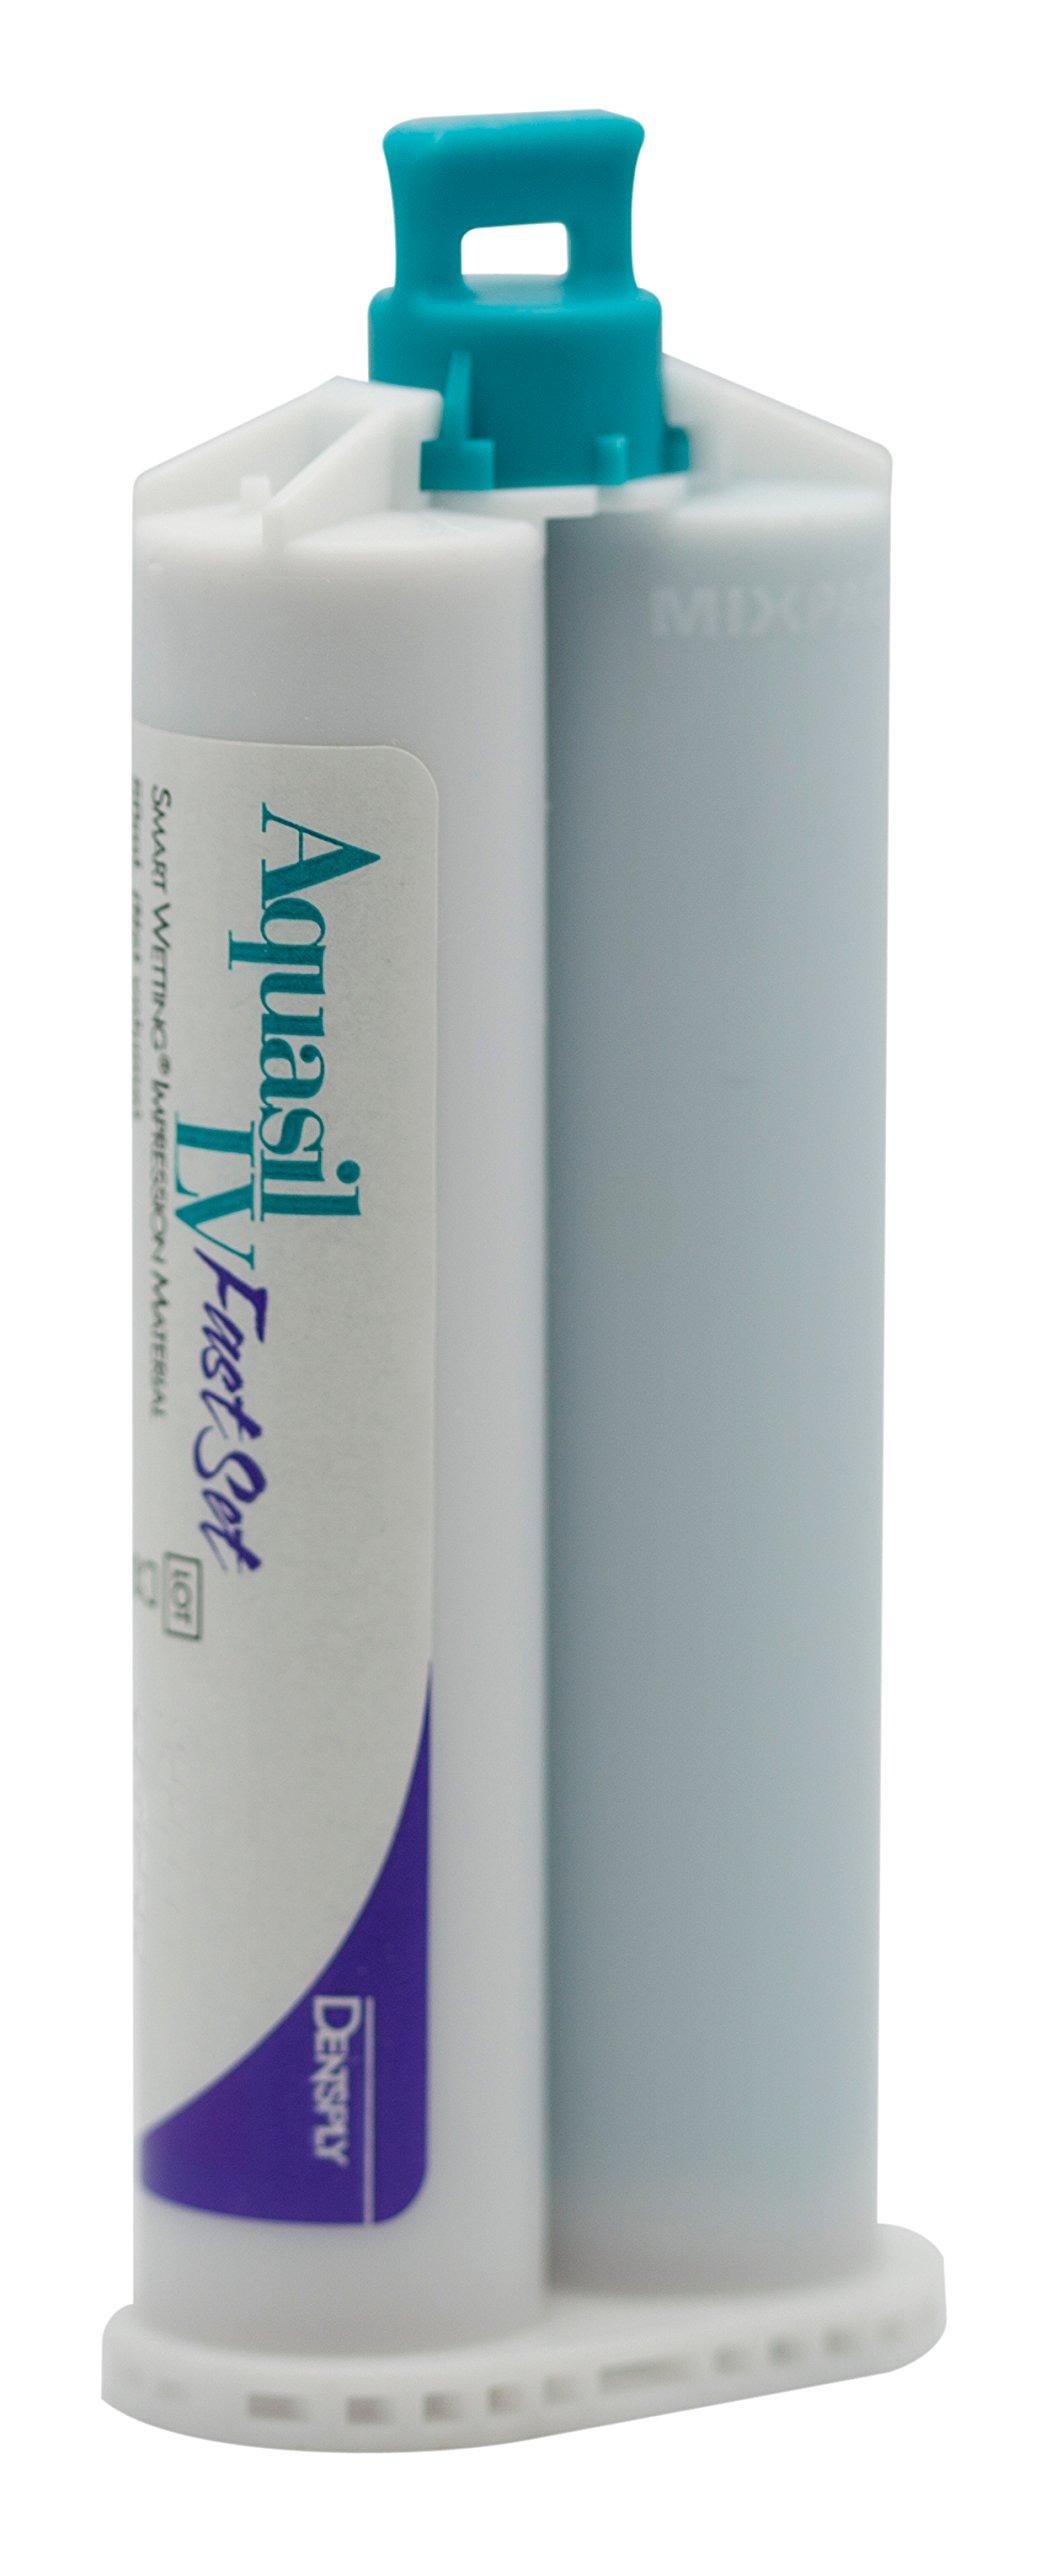 Dentsply 678415 Aquasil Smart Wetting Impression Material, Cartridge Refill, Fast Set, Teal, 50ml